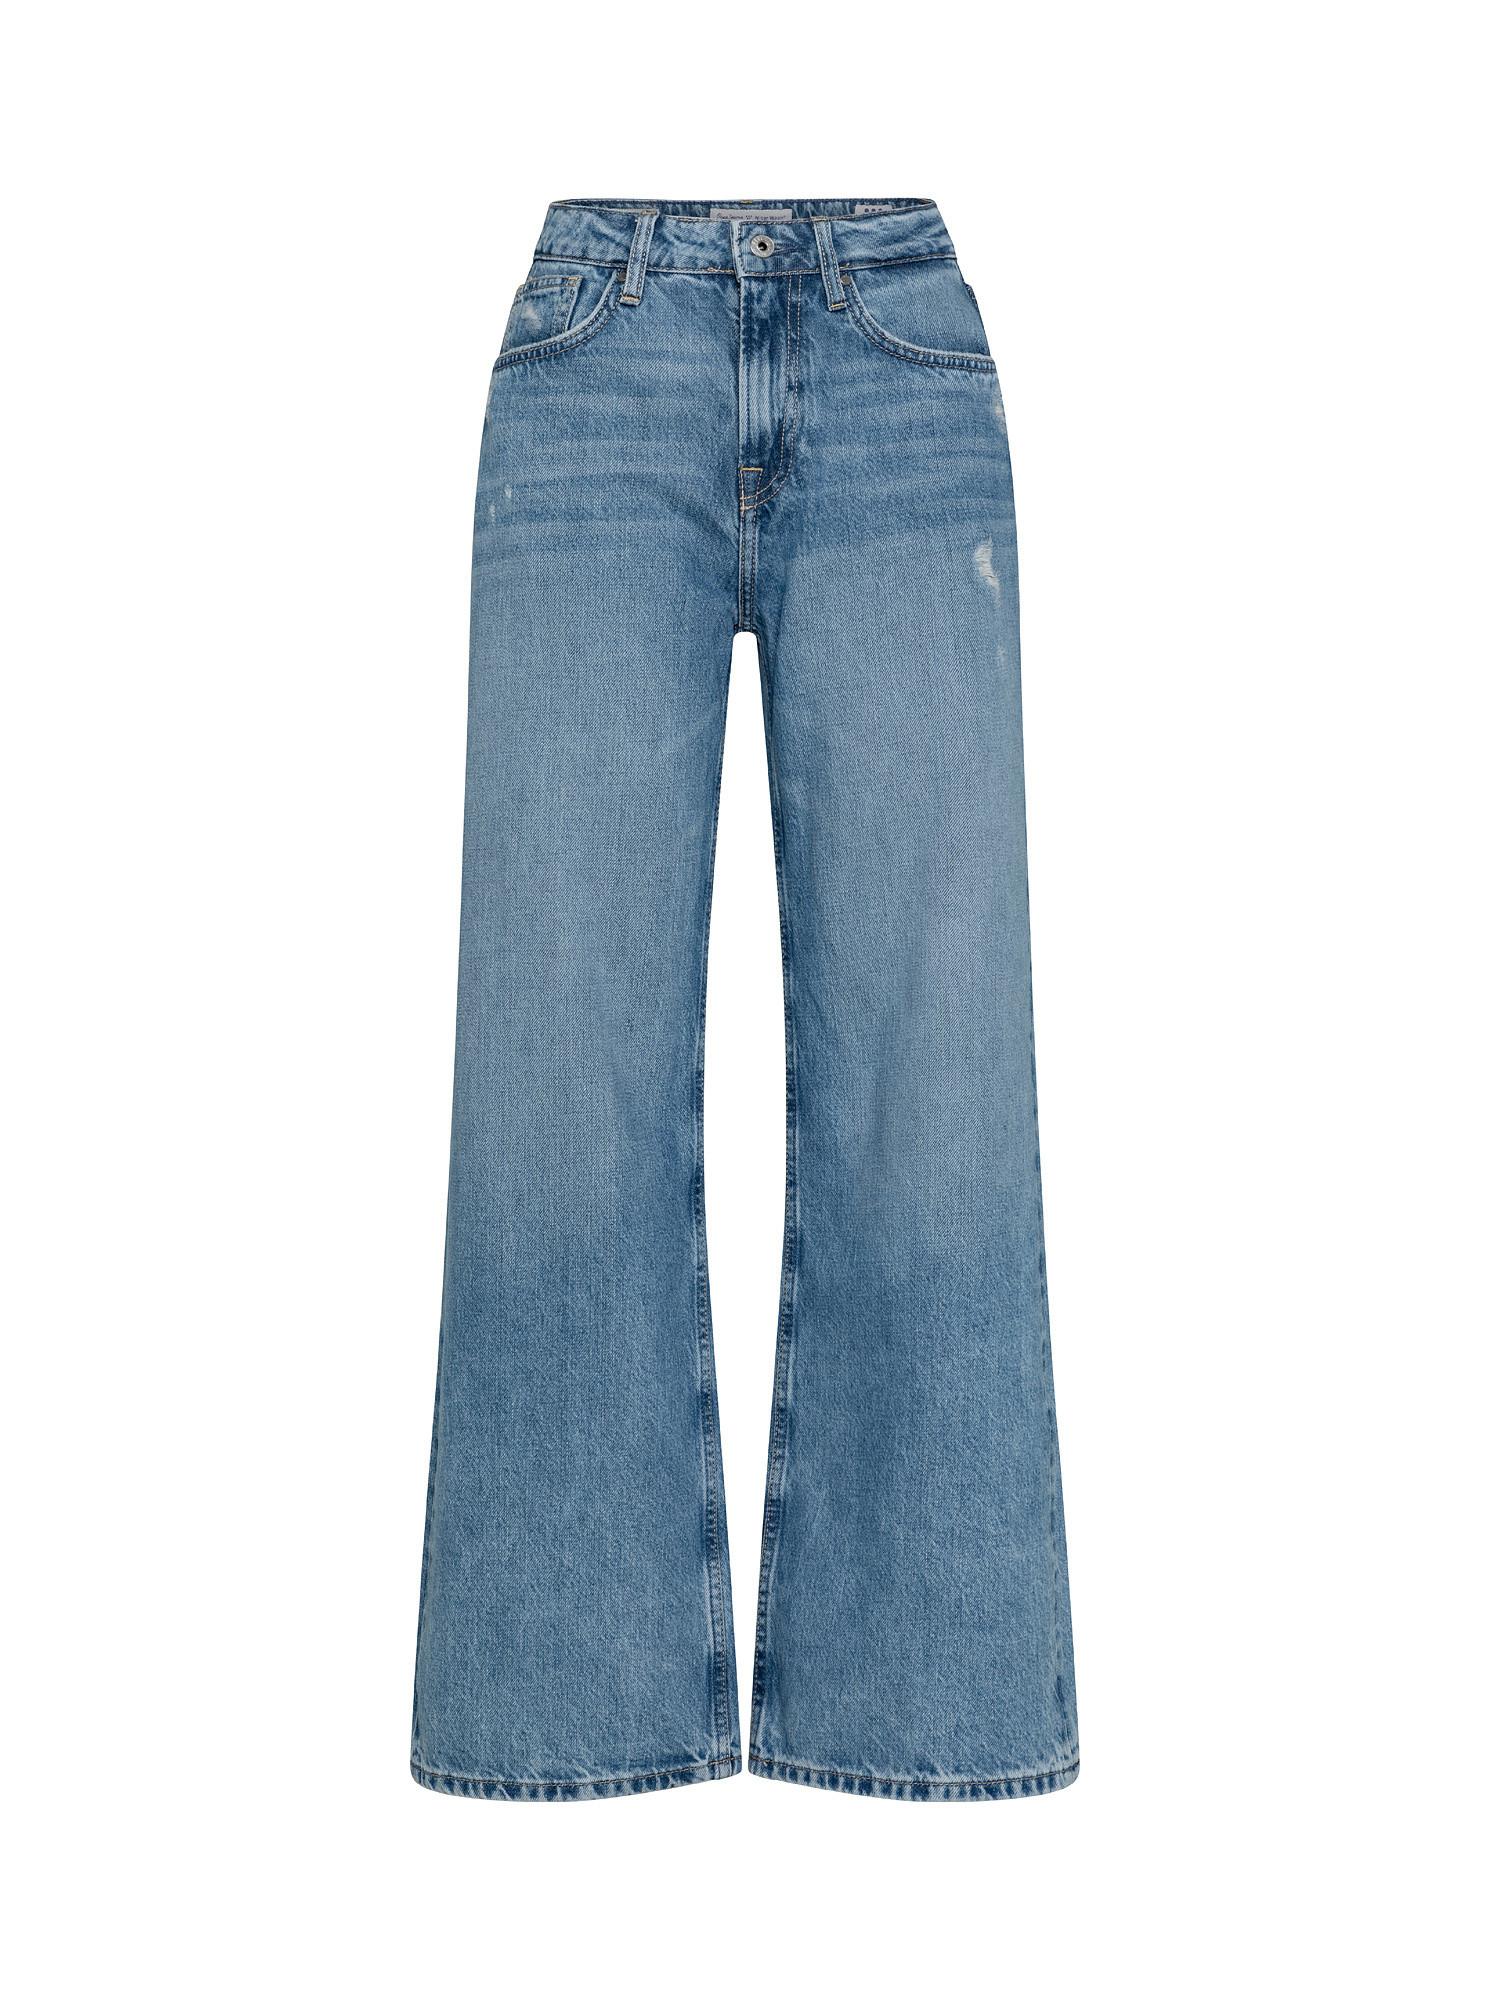 Jeans donna Faith, Denim, large image number 0